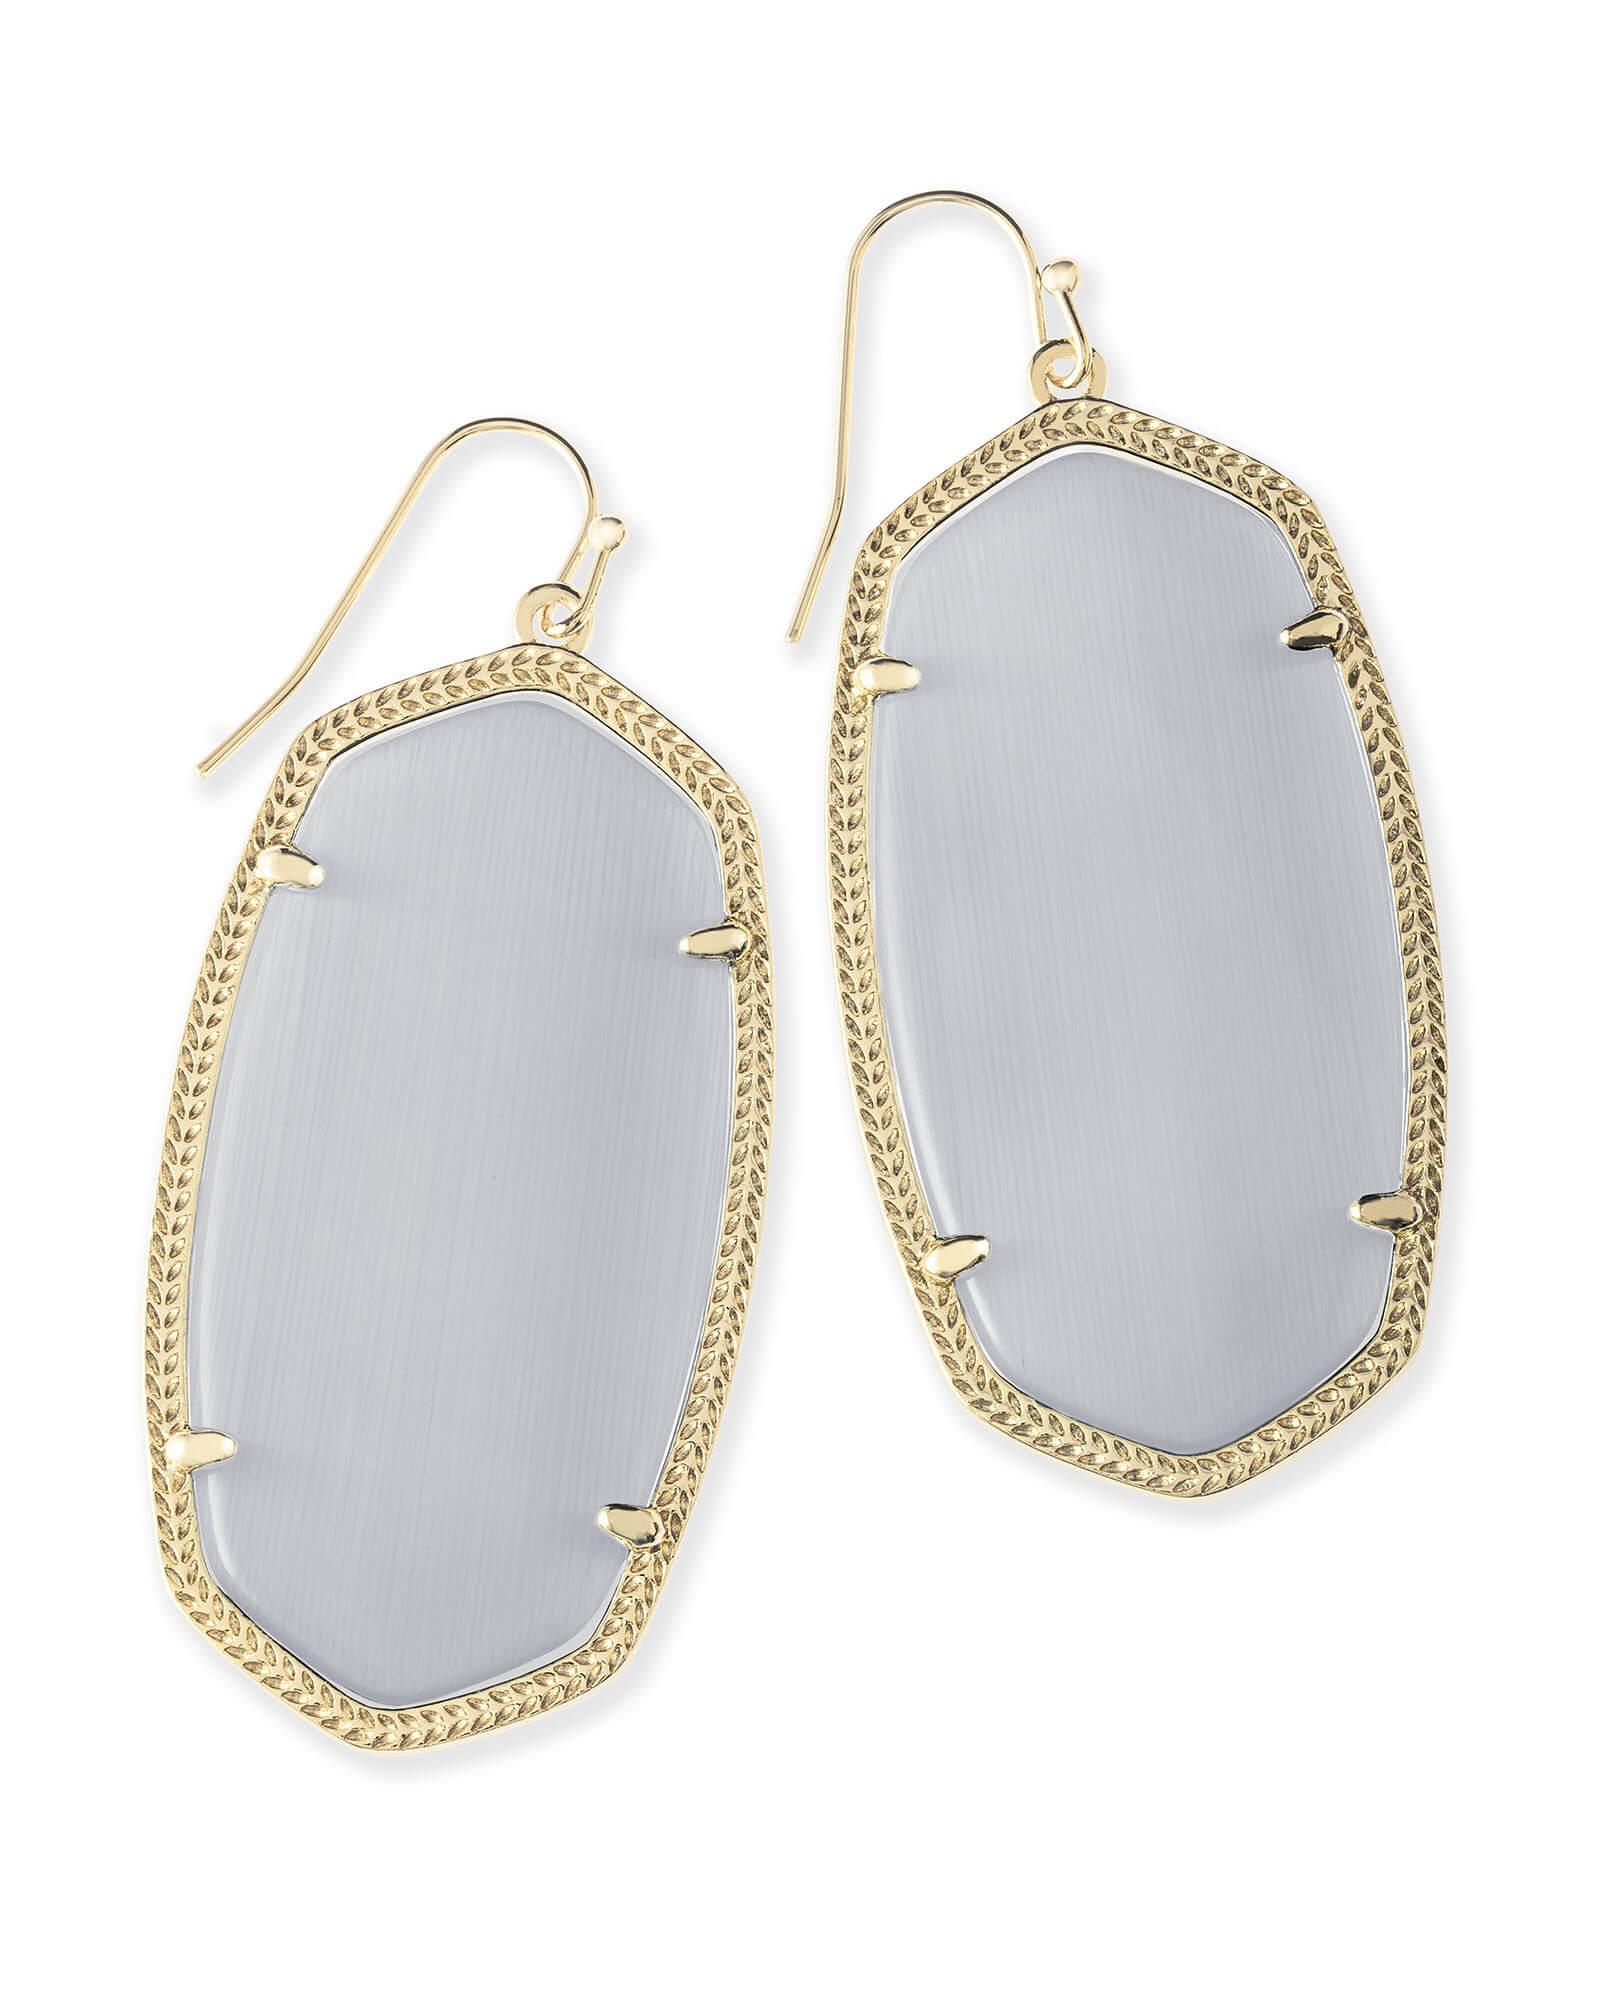 c120f8ac0f70b Danielle Gold Earrings in Slate